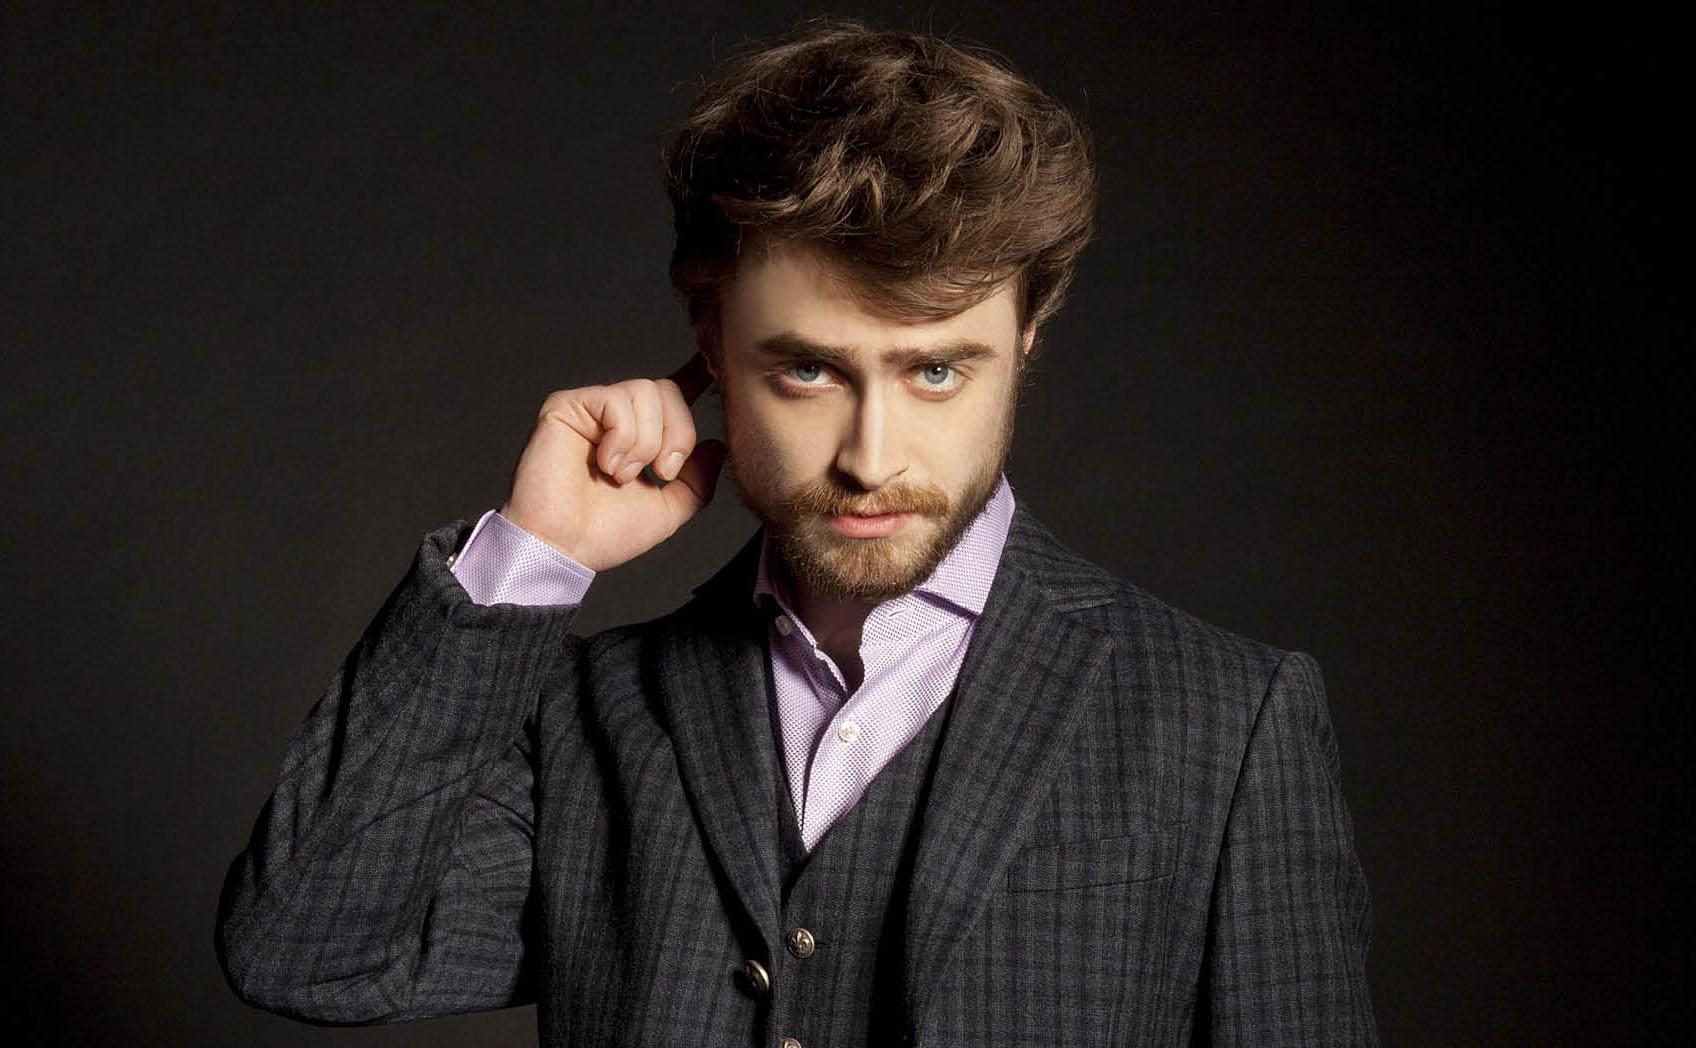 Daniel Radcliffe - age: 28